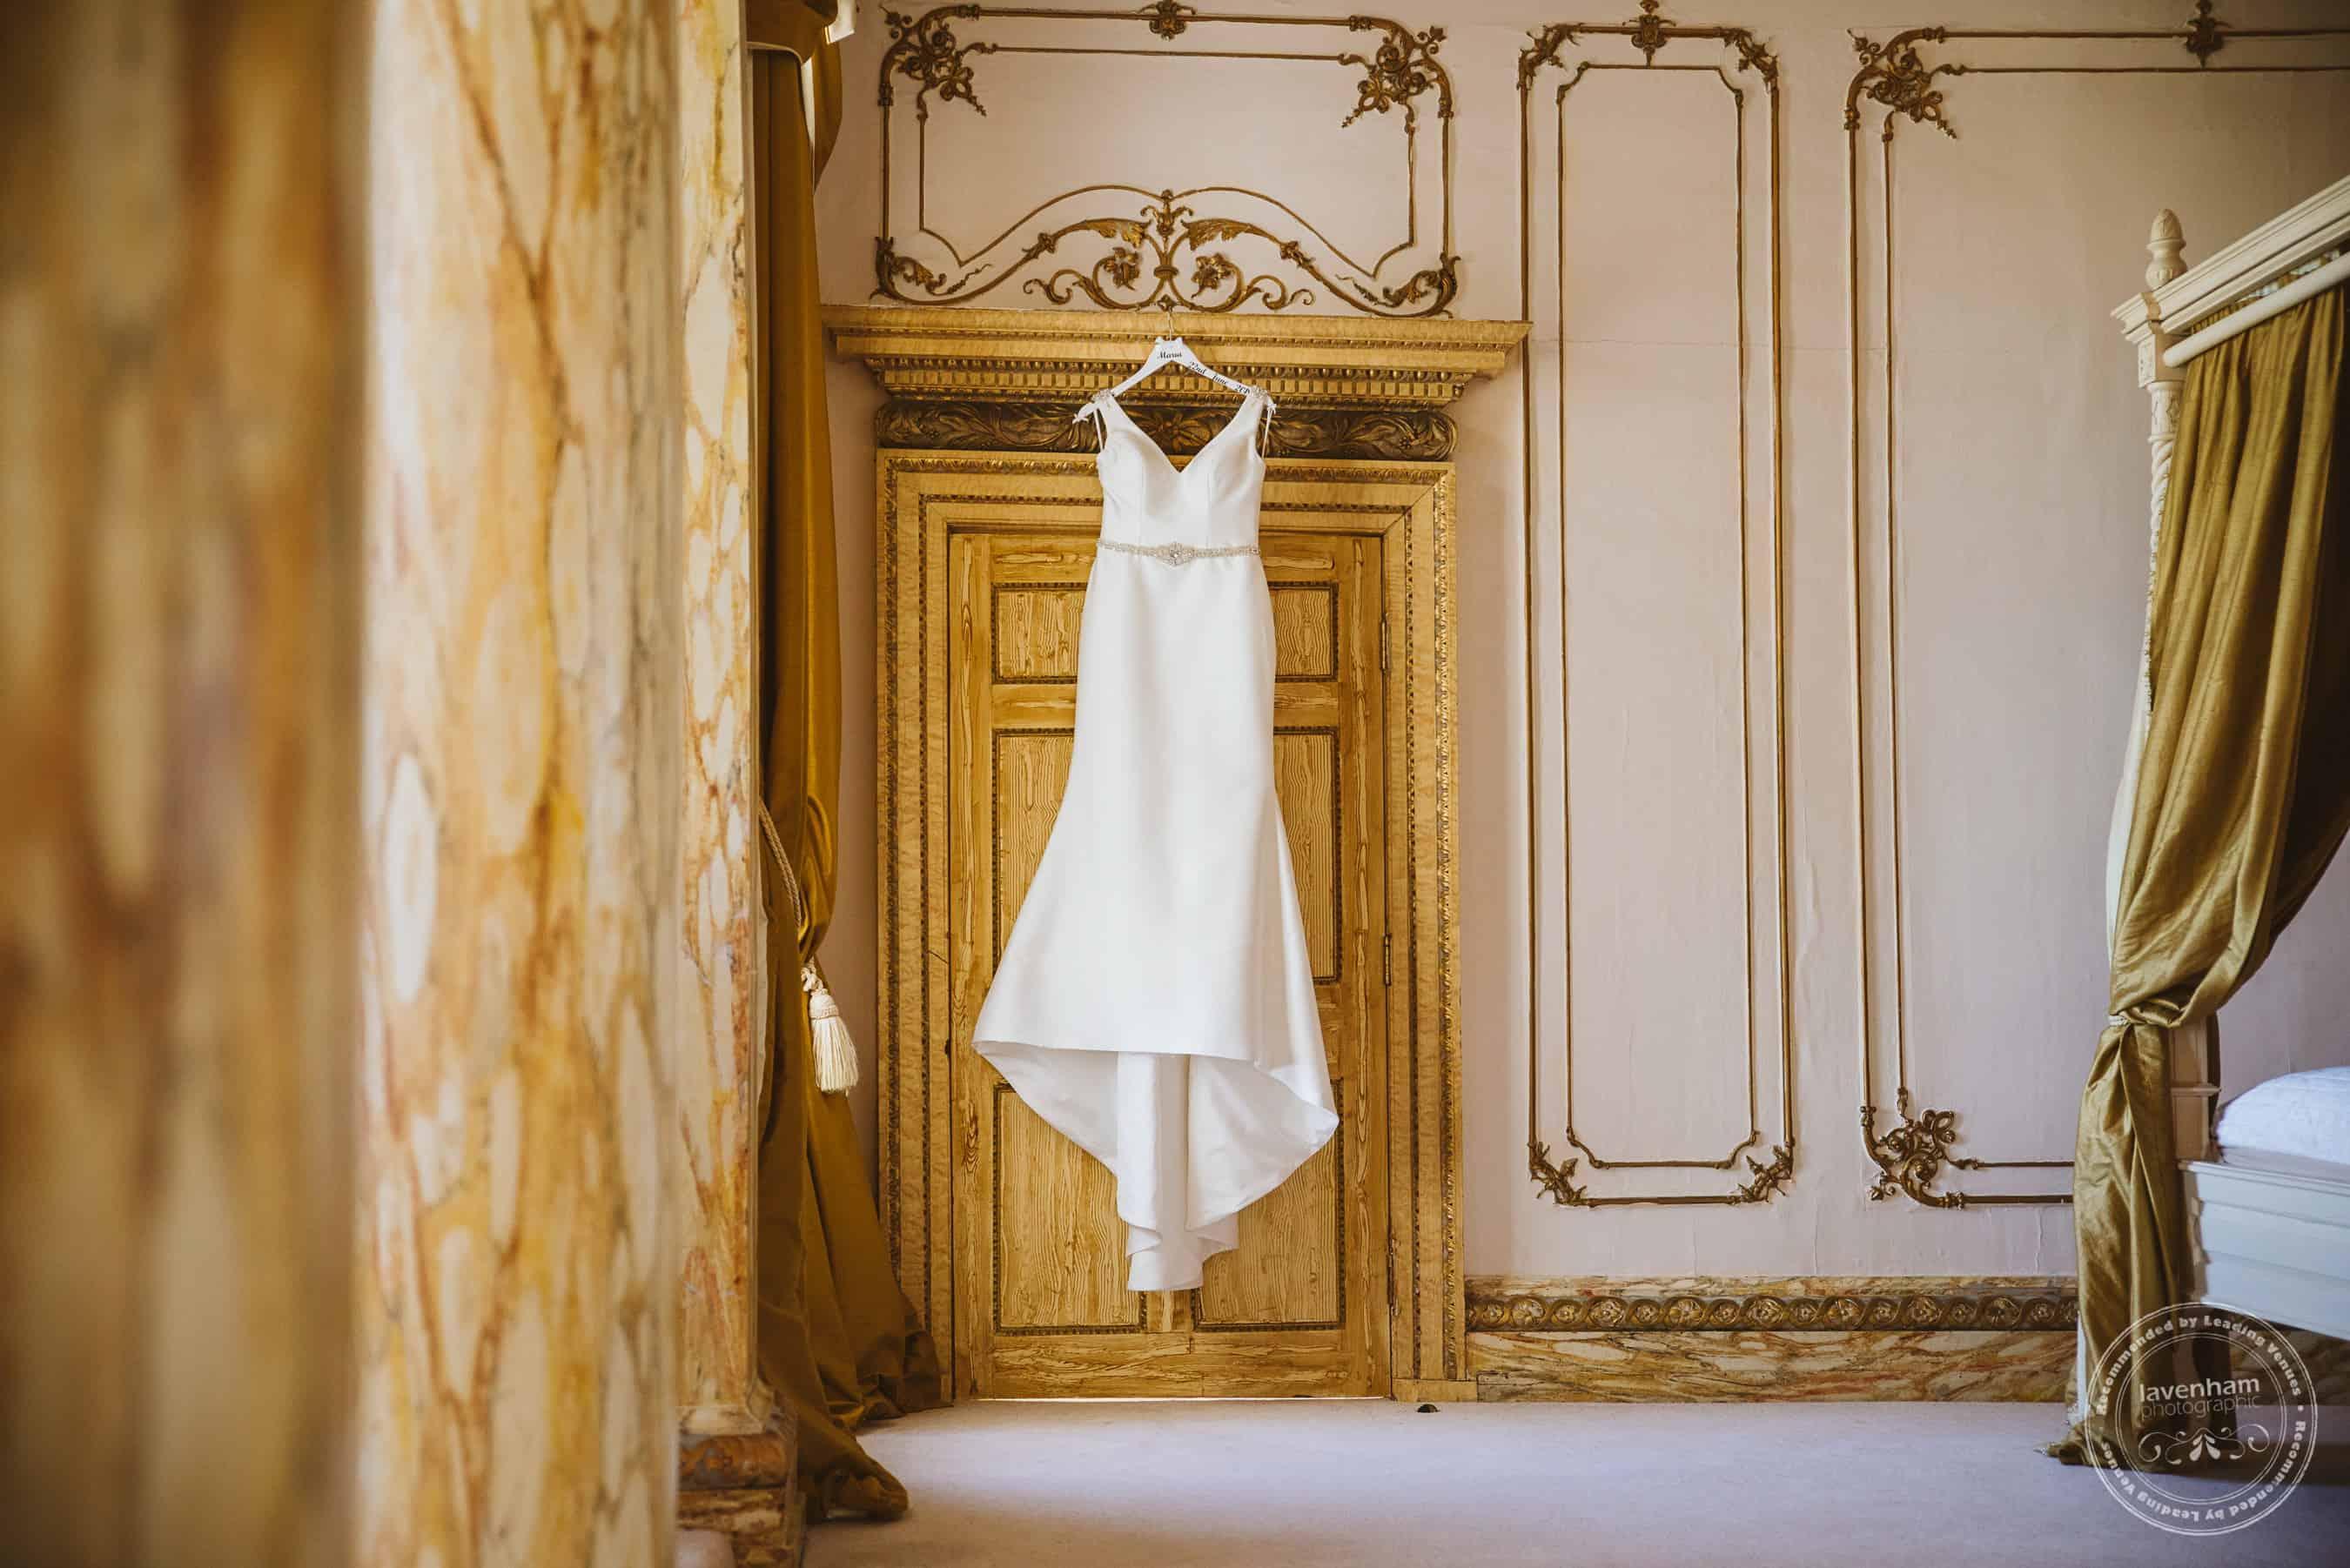 220618 Gosfield Hall Wedding Photography Lavenham Photographic 0013